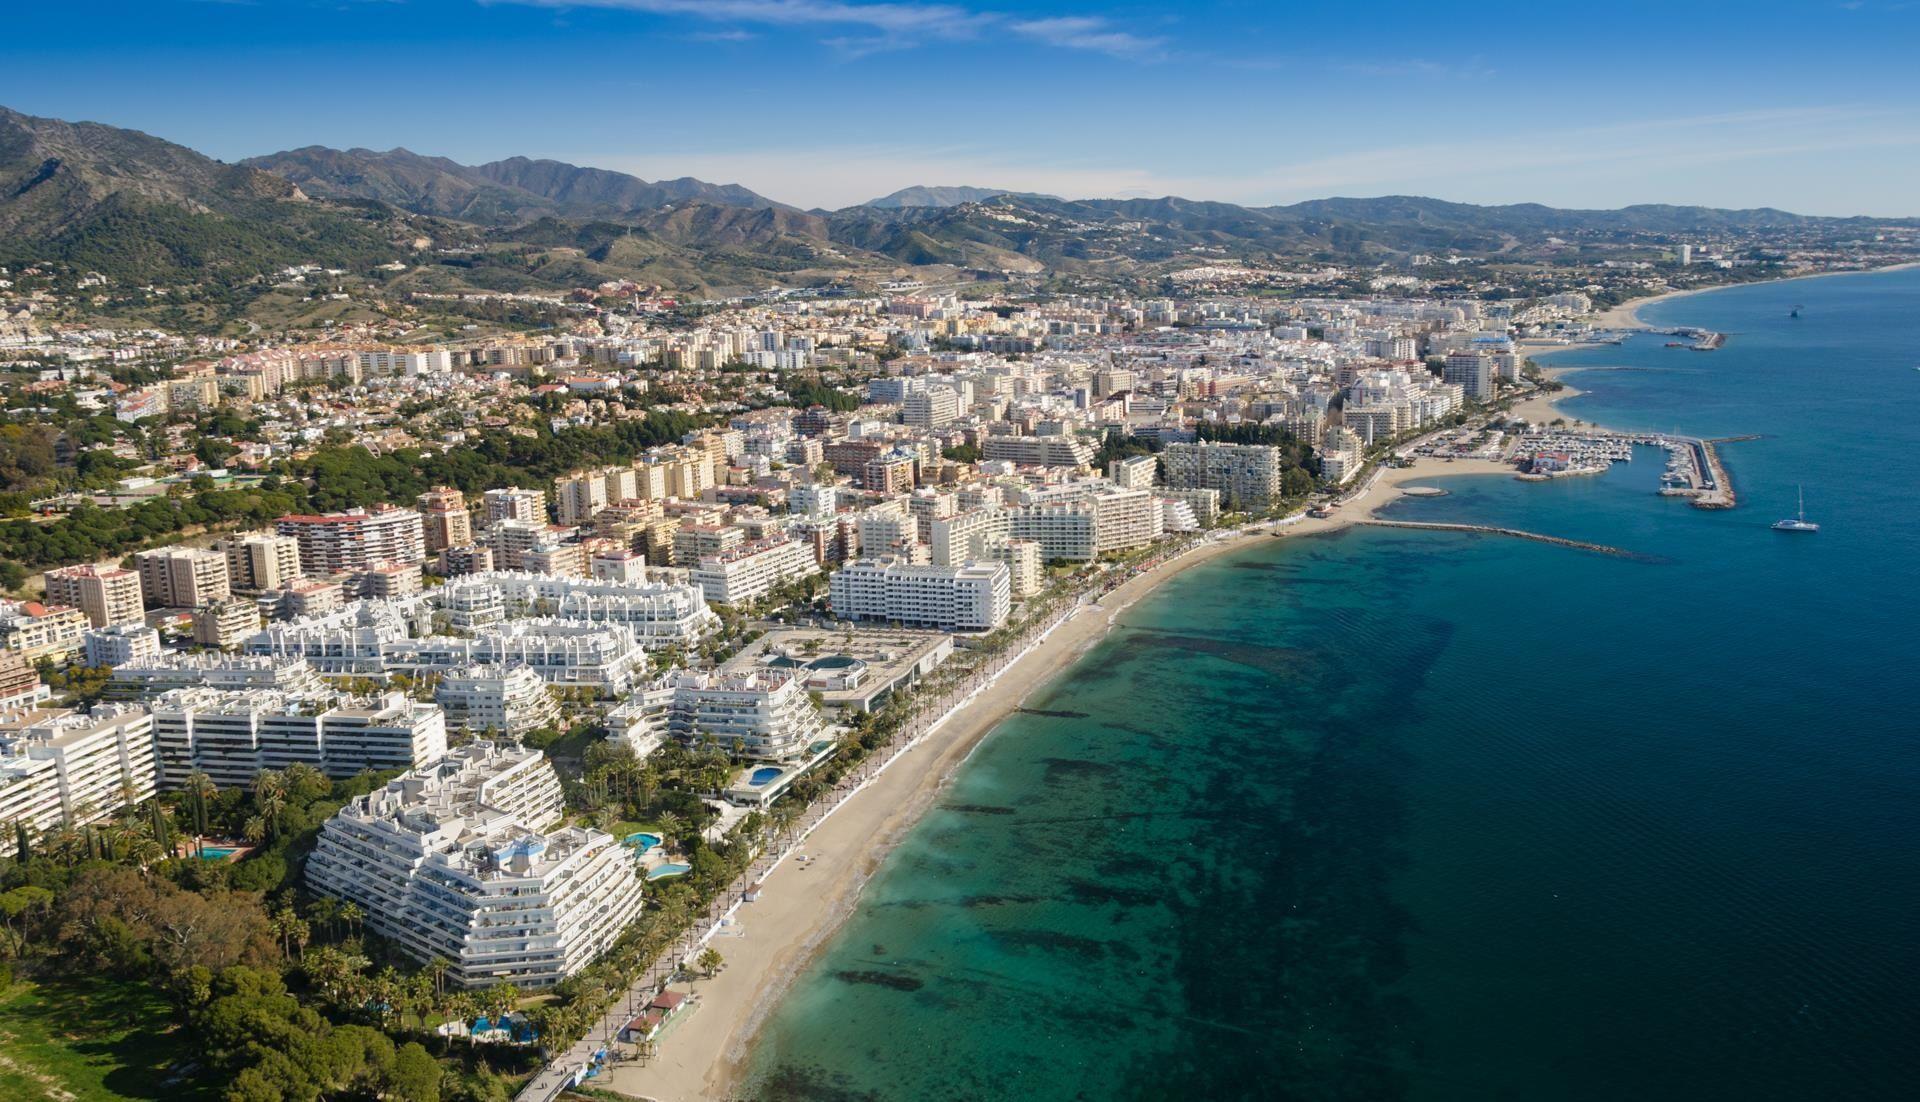 Veduta su Marbella, nota località turistica andalusa